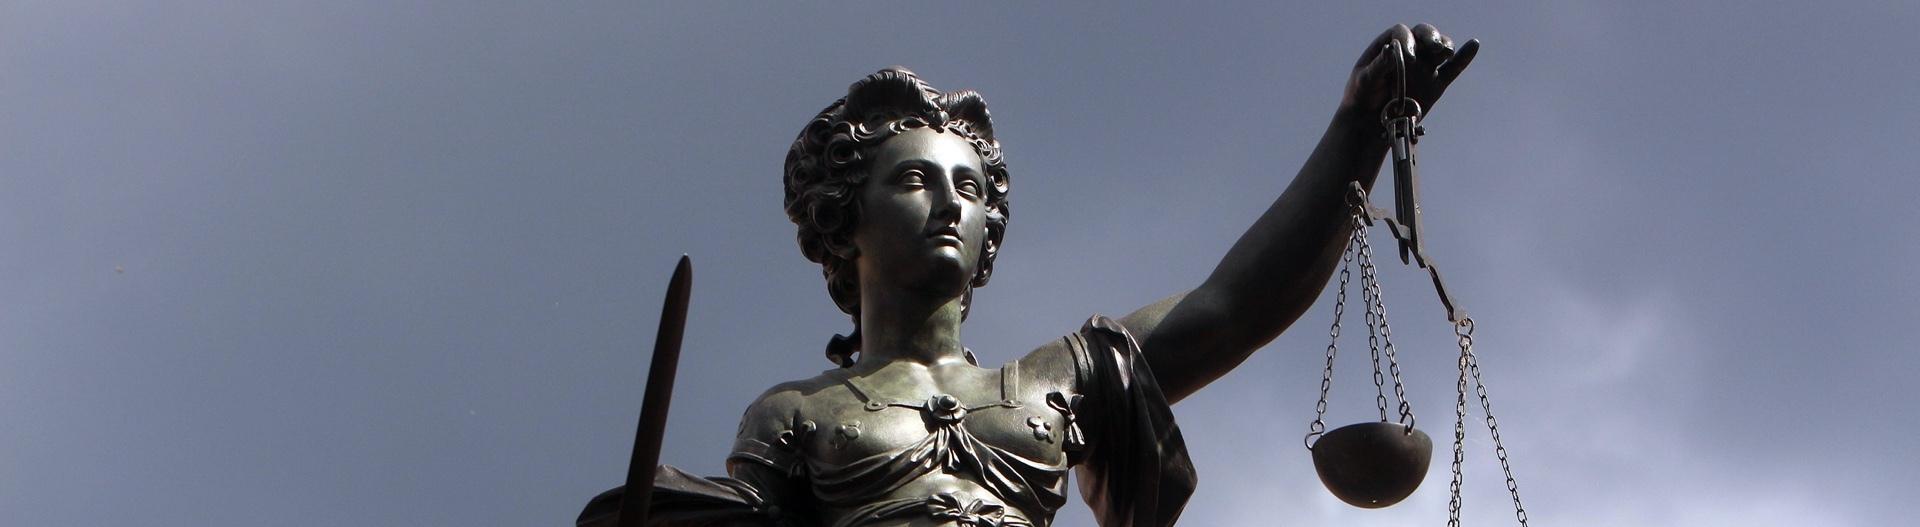 Justizia auf dem Römerberg in Frankfurt am Main